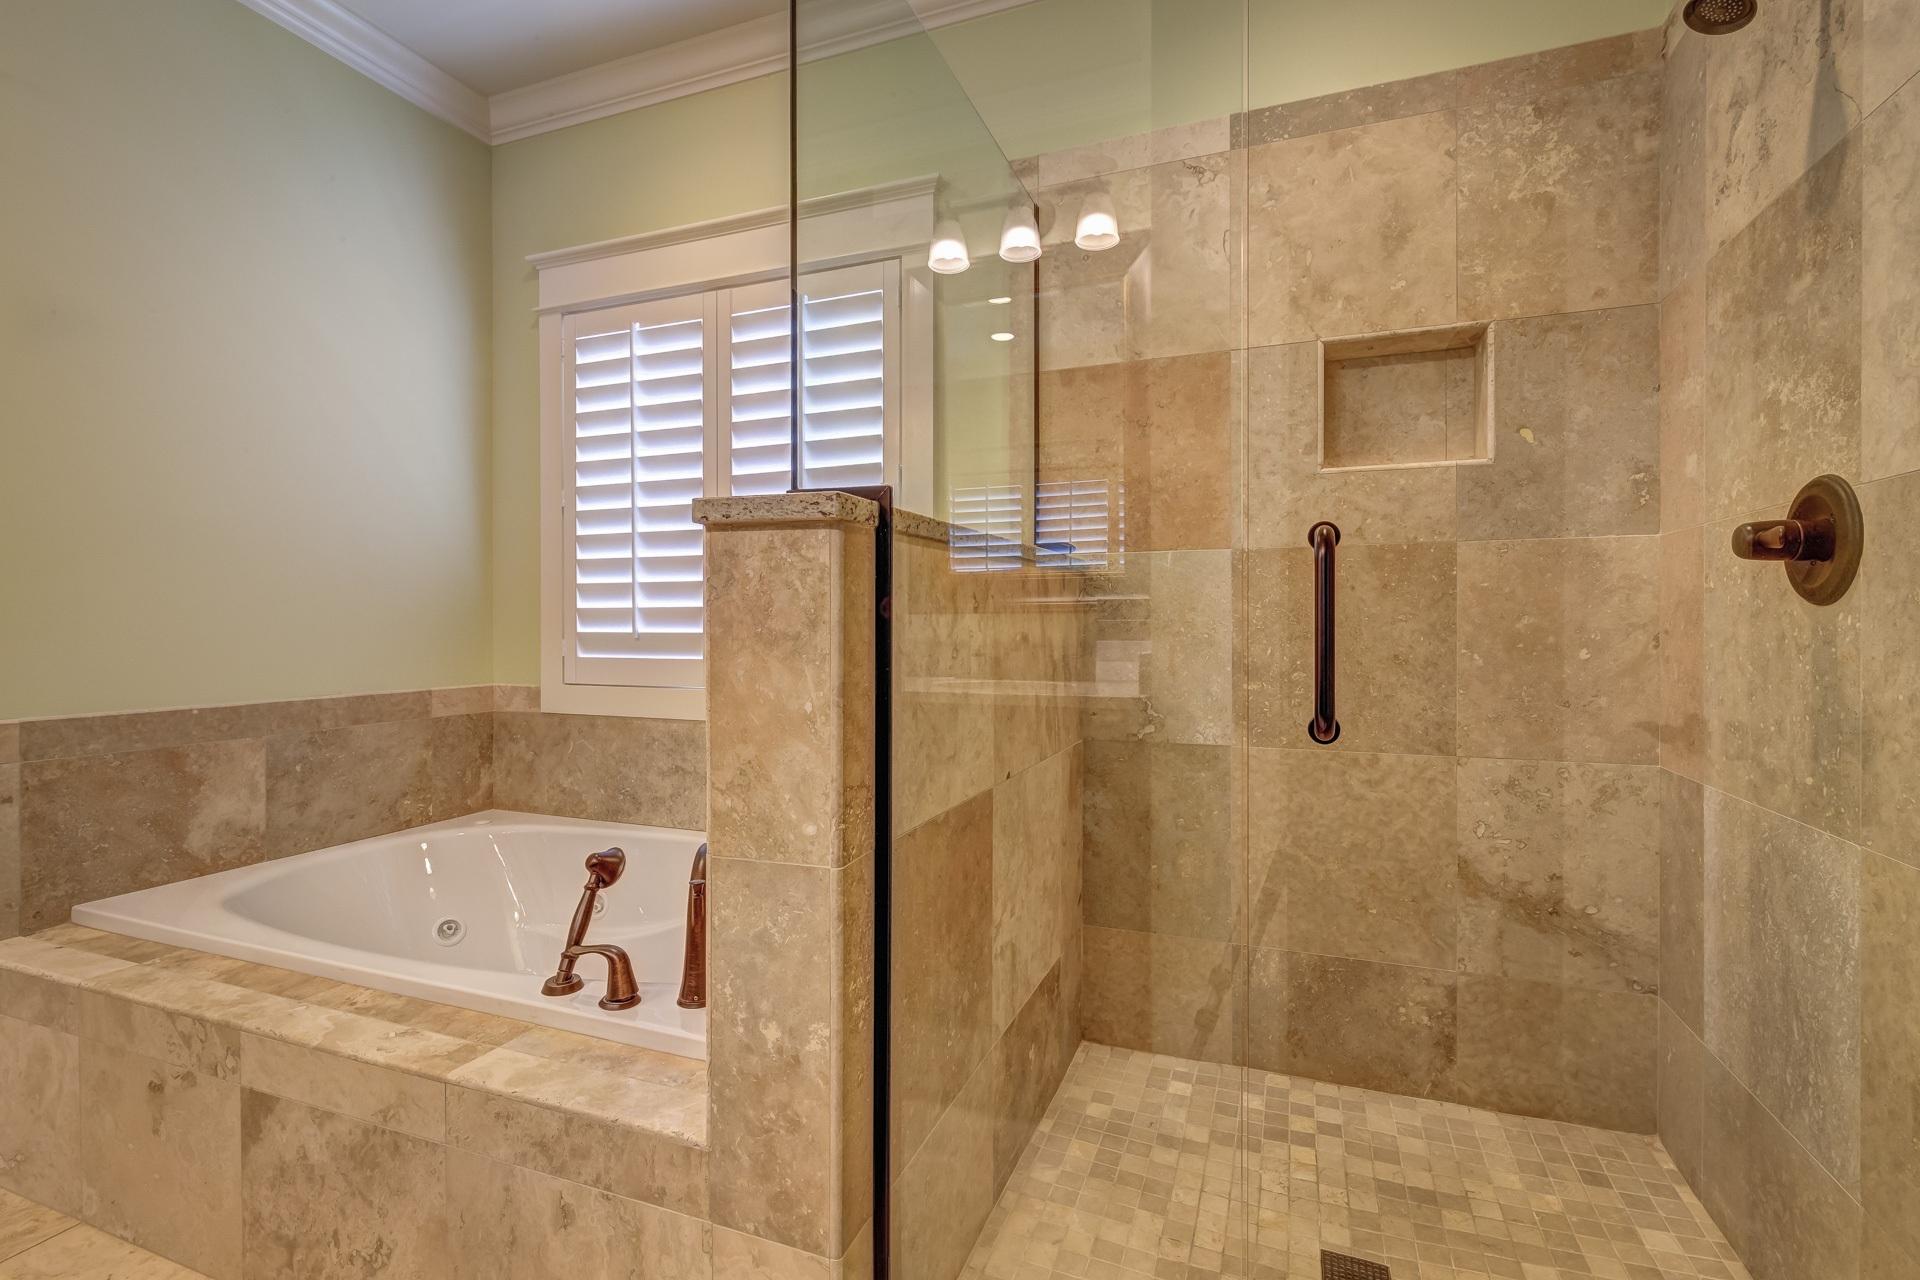 image - Best Materials for Bathroom Walls